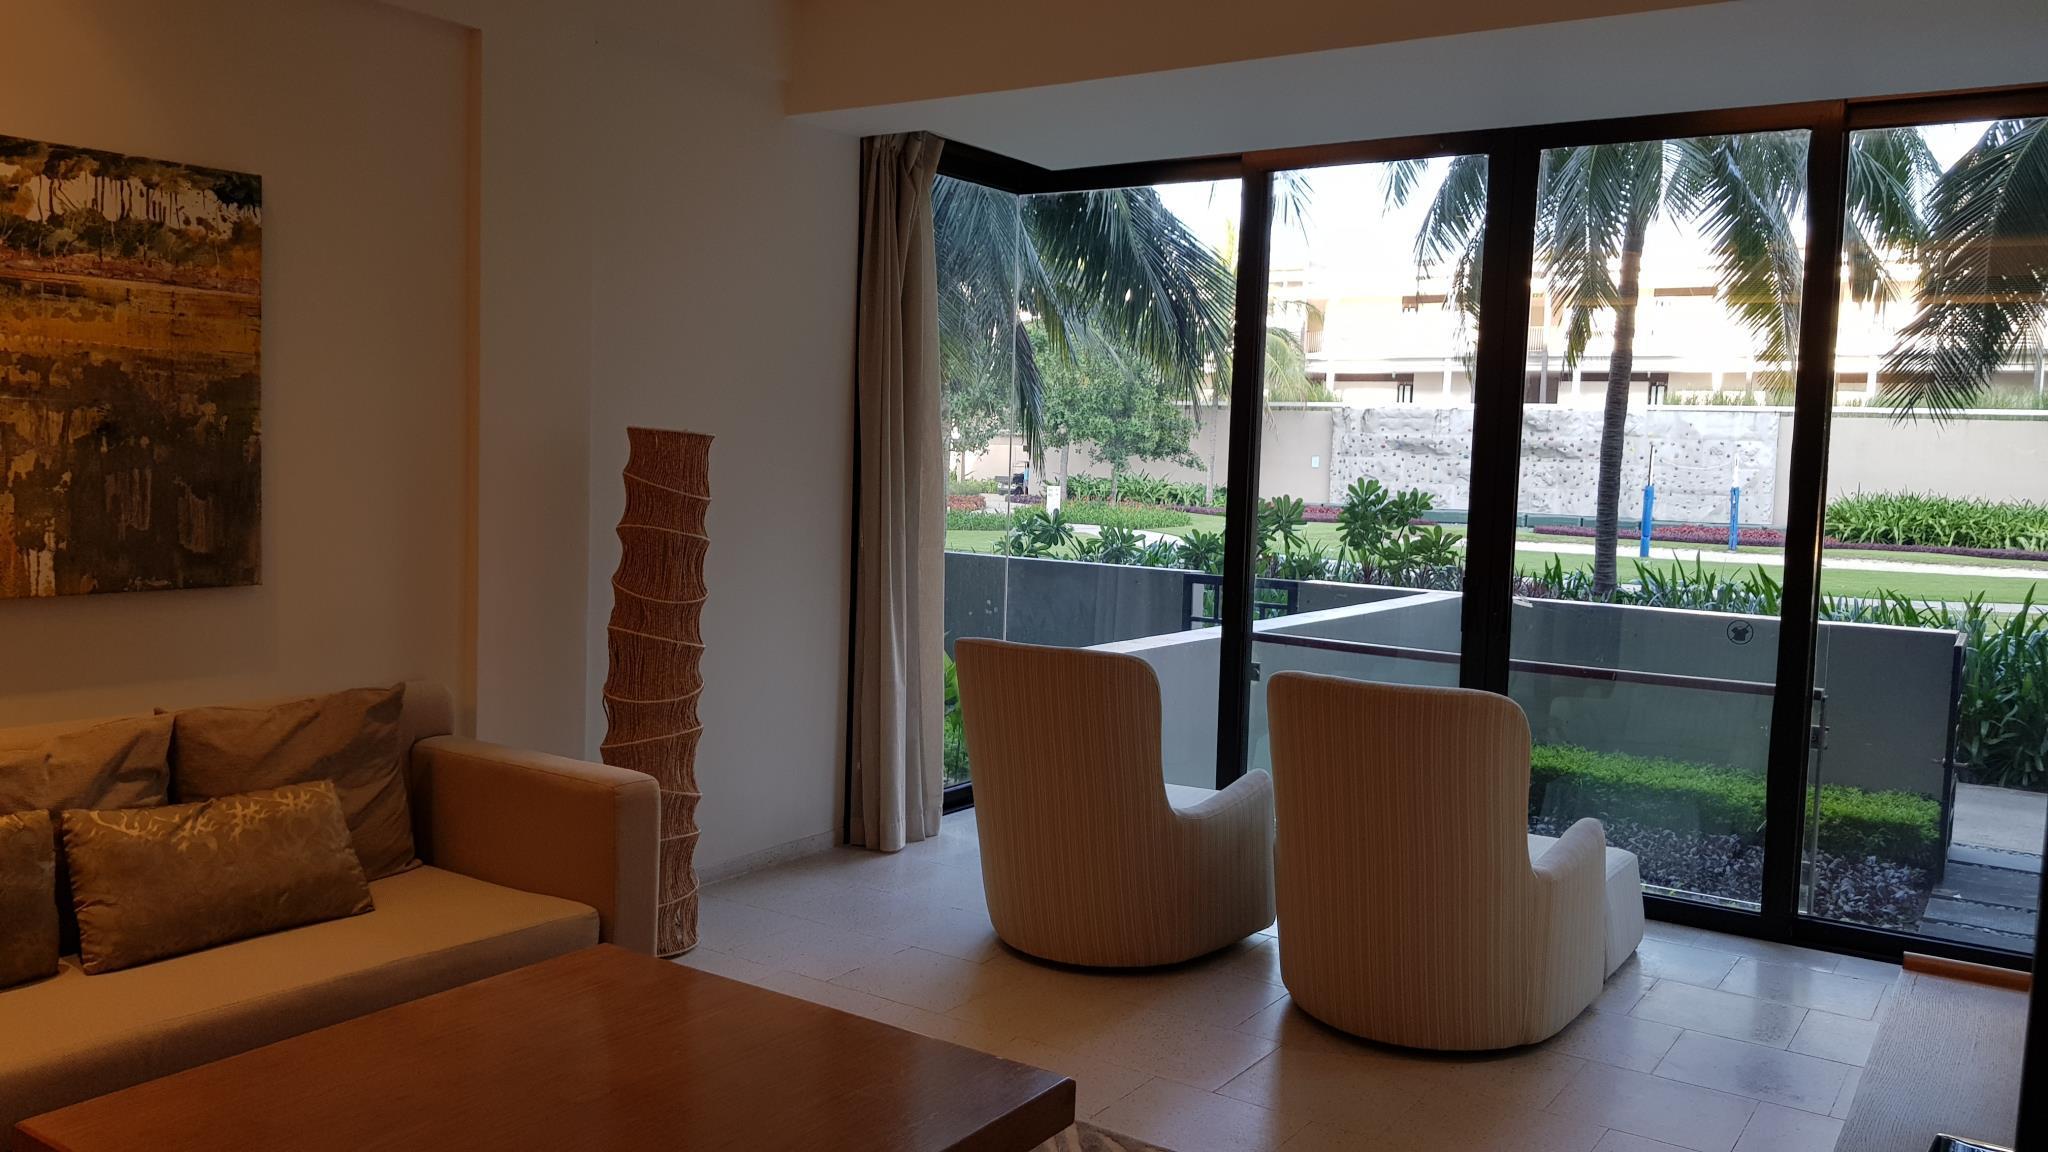 1BR Apartment At The 5 Stars Resort H Danang